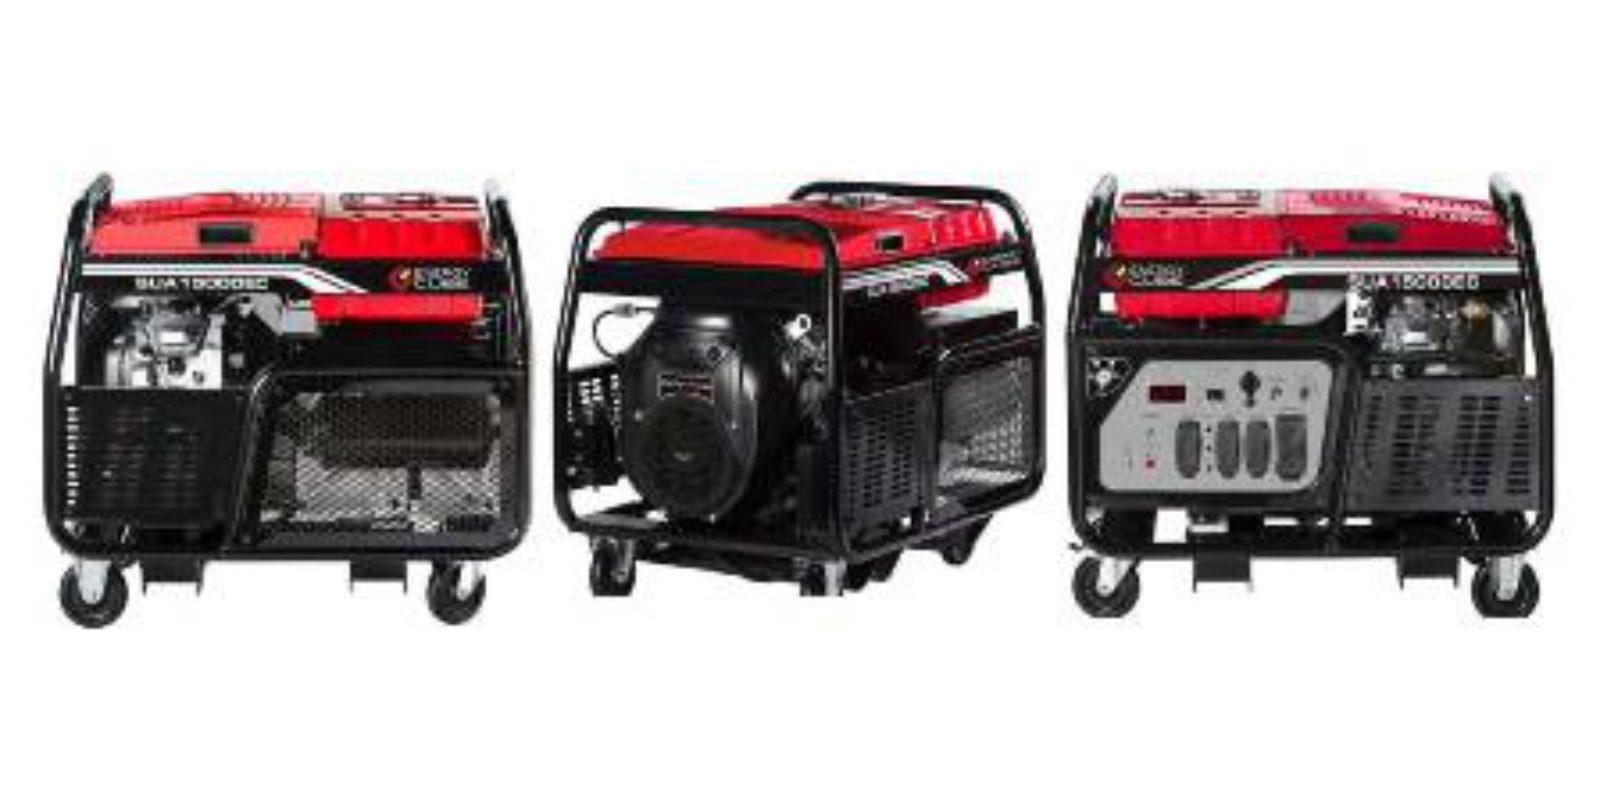 A Ipower Sua15000ec Pure Sine Wave Generator Review It S